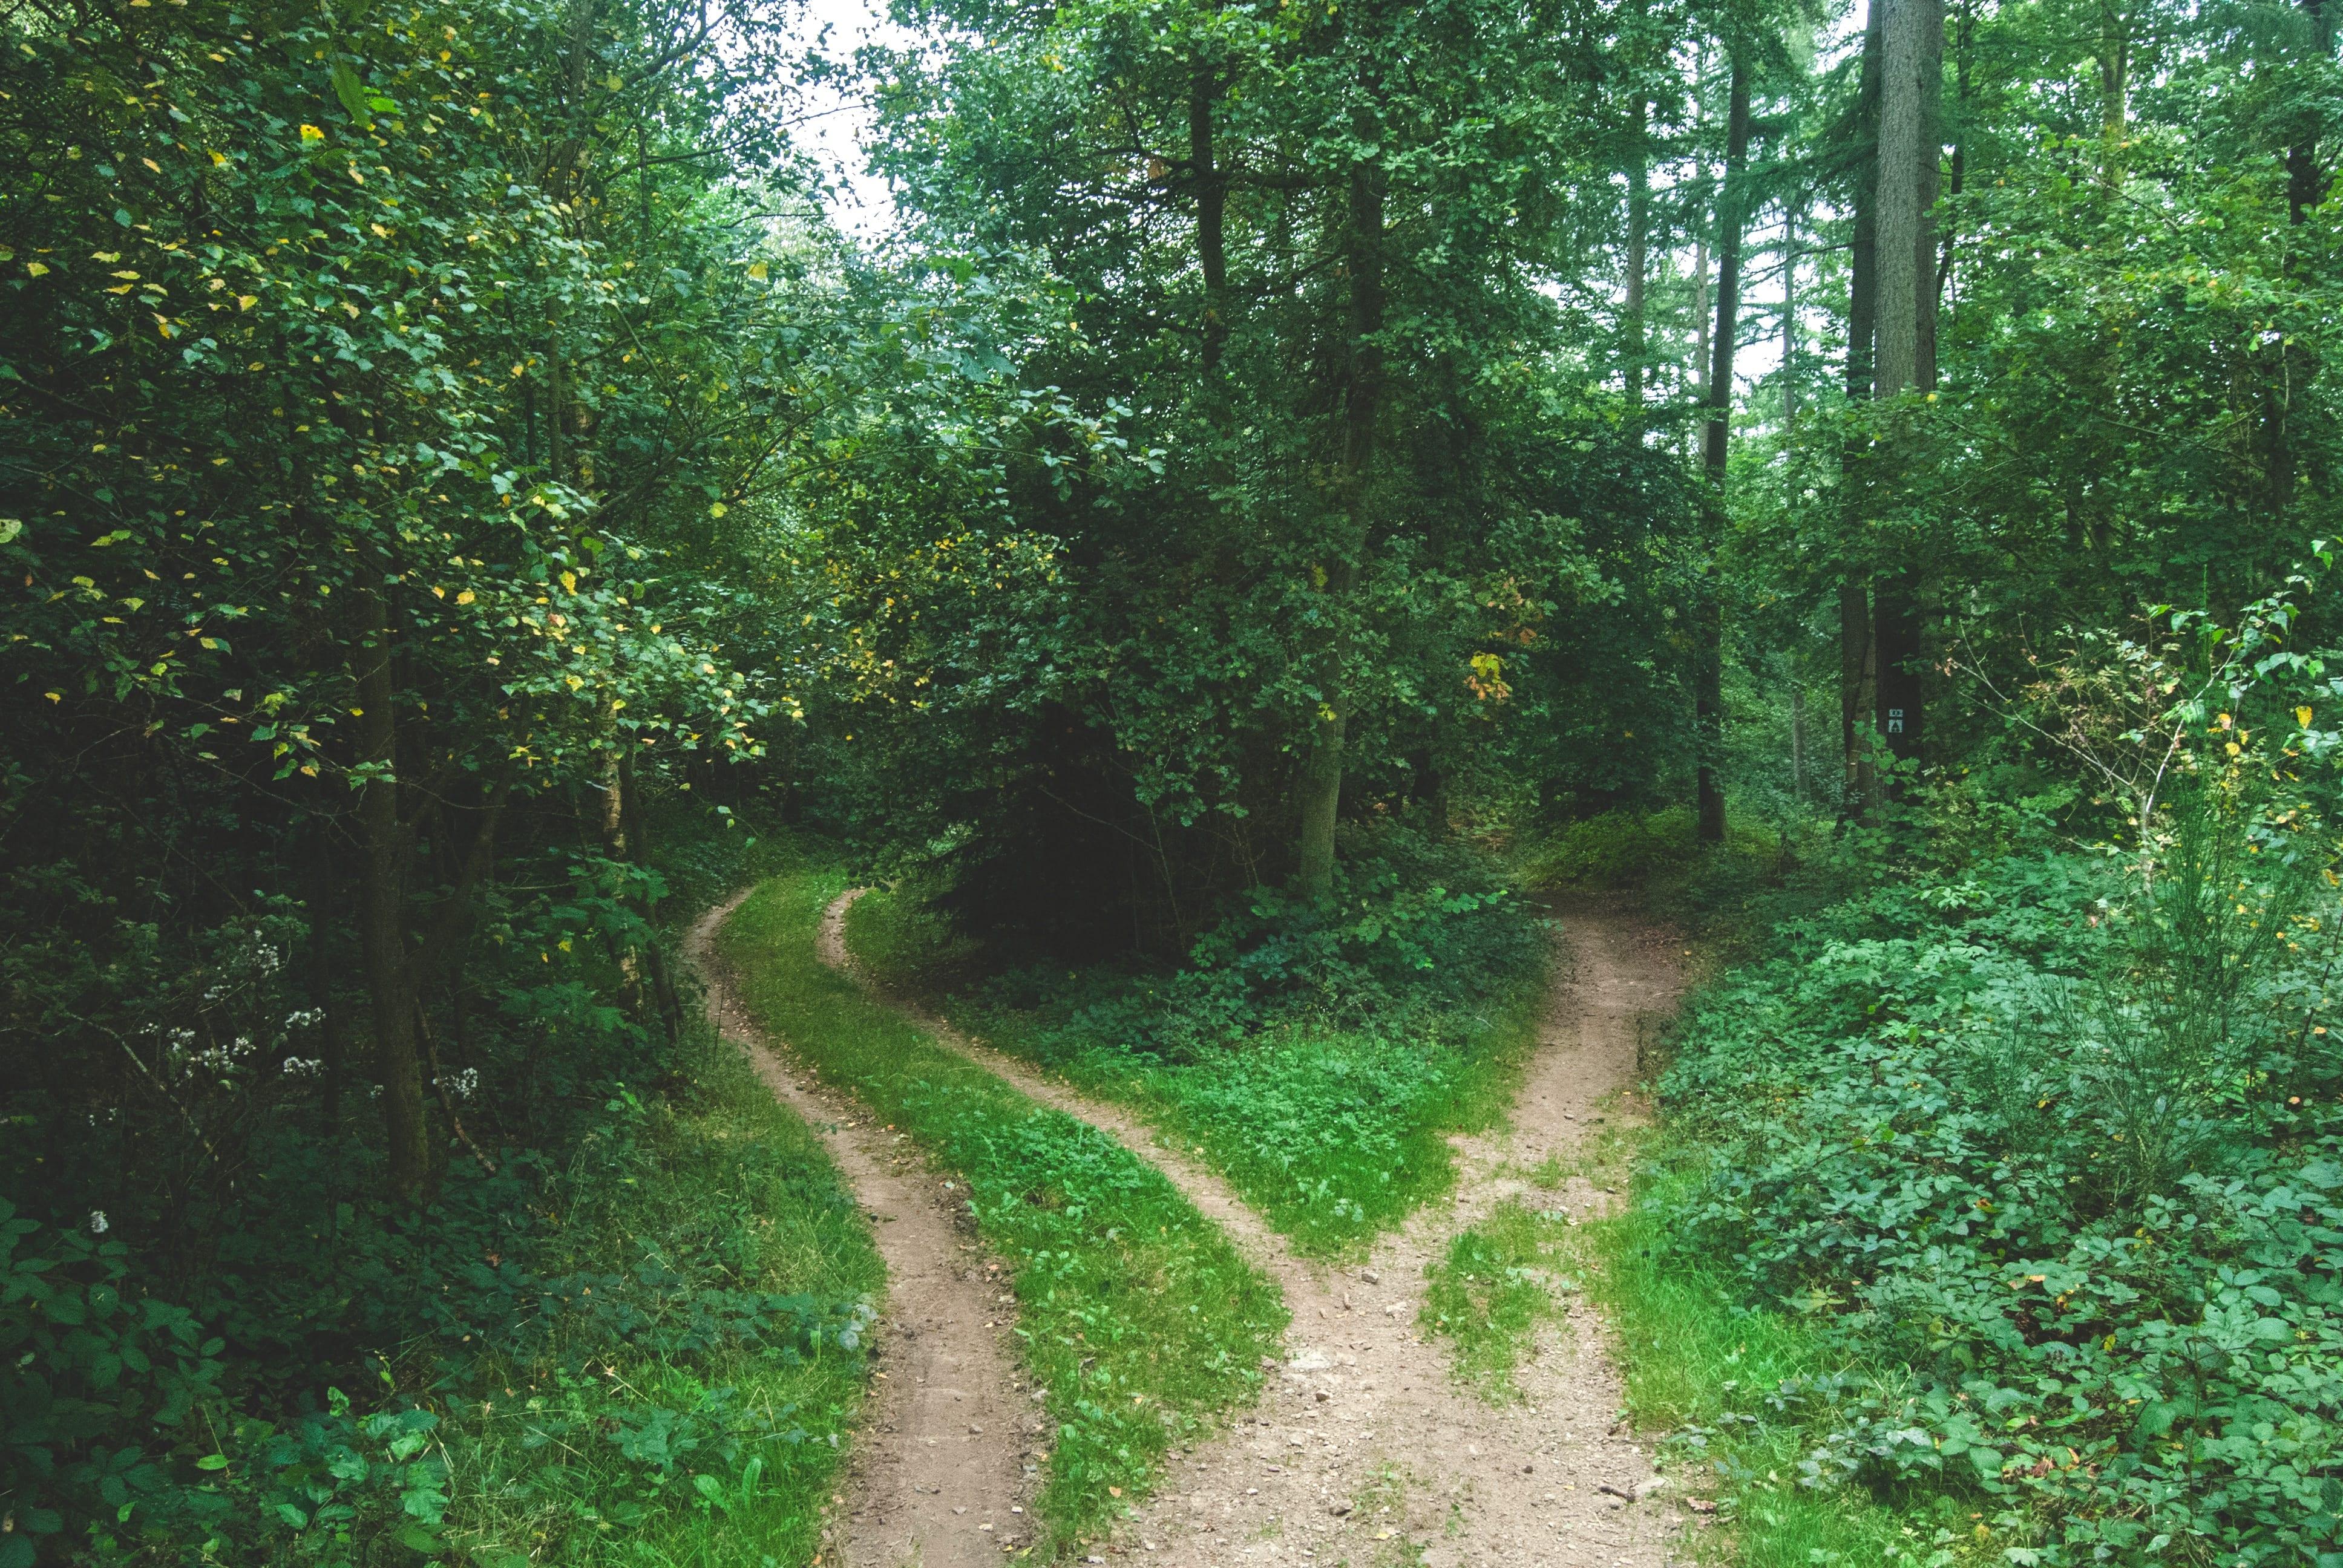 Forest path forking around trees; image by Jens Lelie, via Unsplash.com.